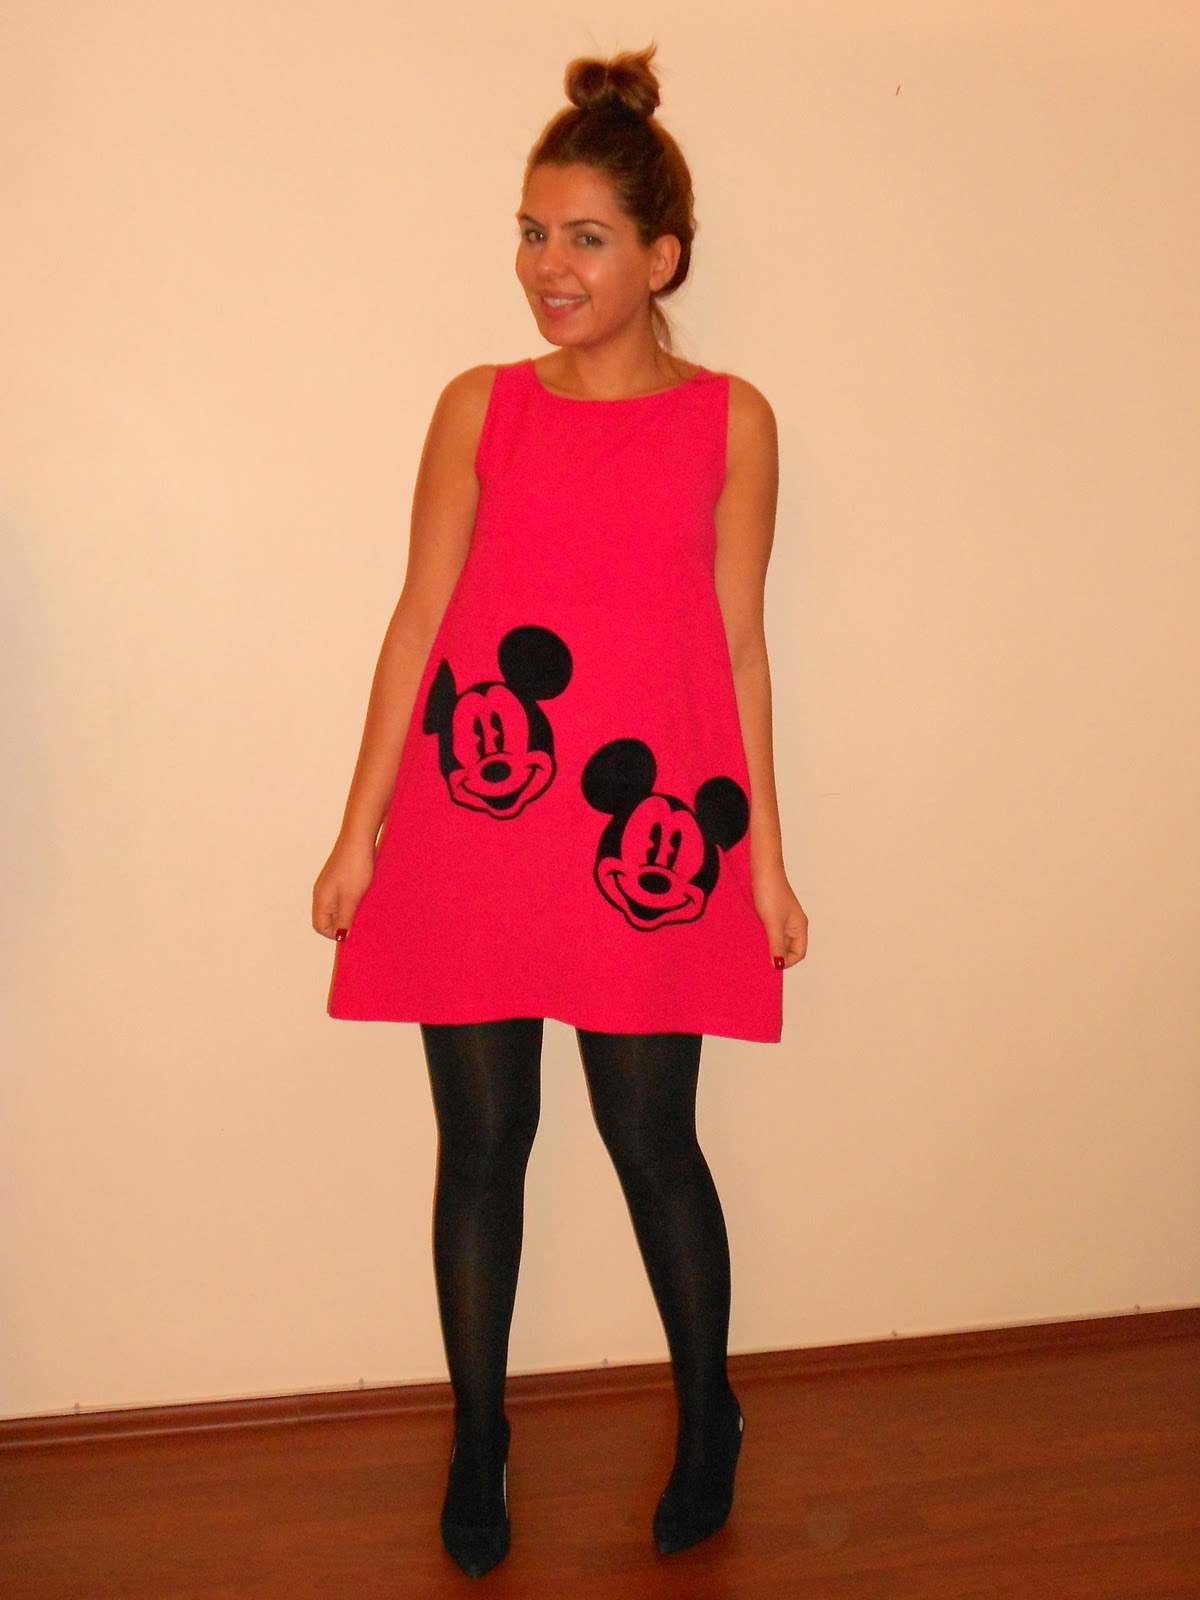 http://4.bp.blogspot.com/-duDbmwKnD24/Ts8_JqntuMI/AAAAAAAAJpc/WM7YataIpDU/s1600/mickey+dress.jpg